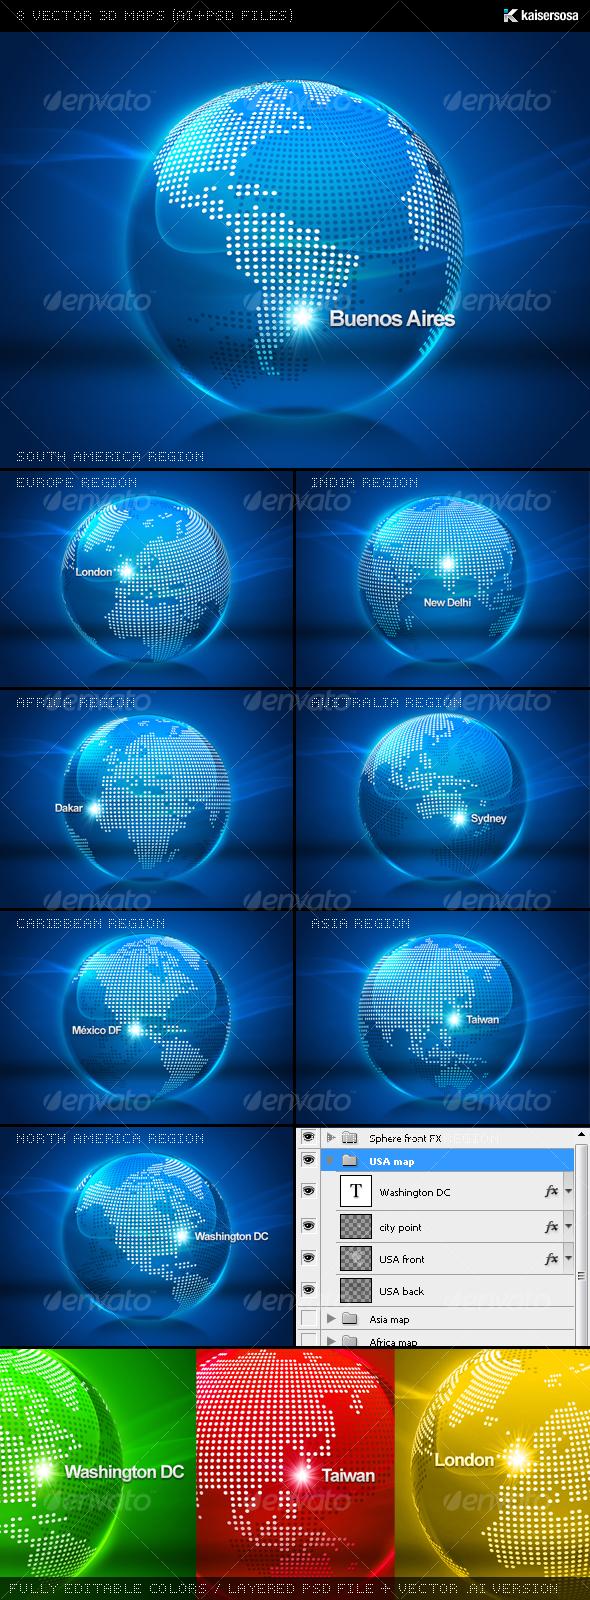 8 Vector 3D Maps (AI+PSD Files) - Web Elements